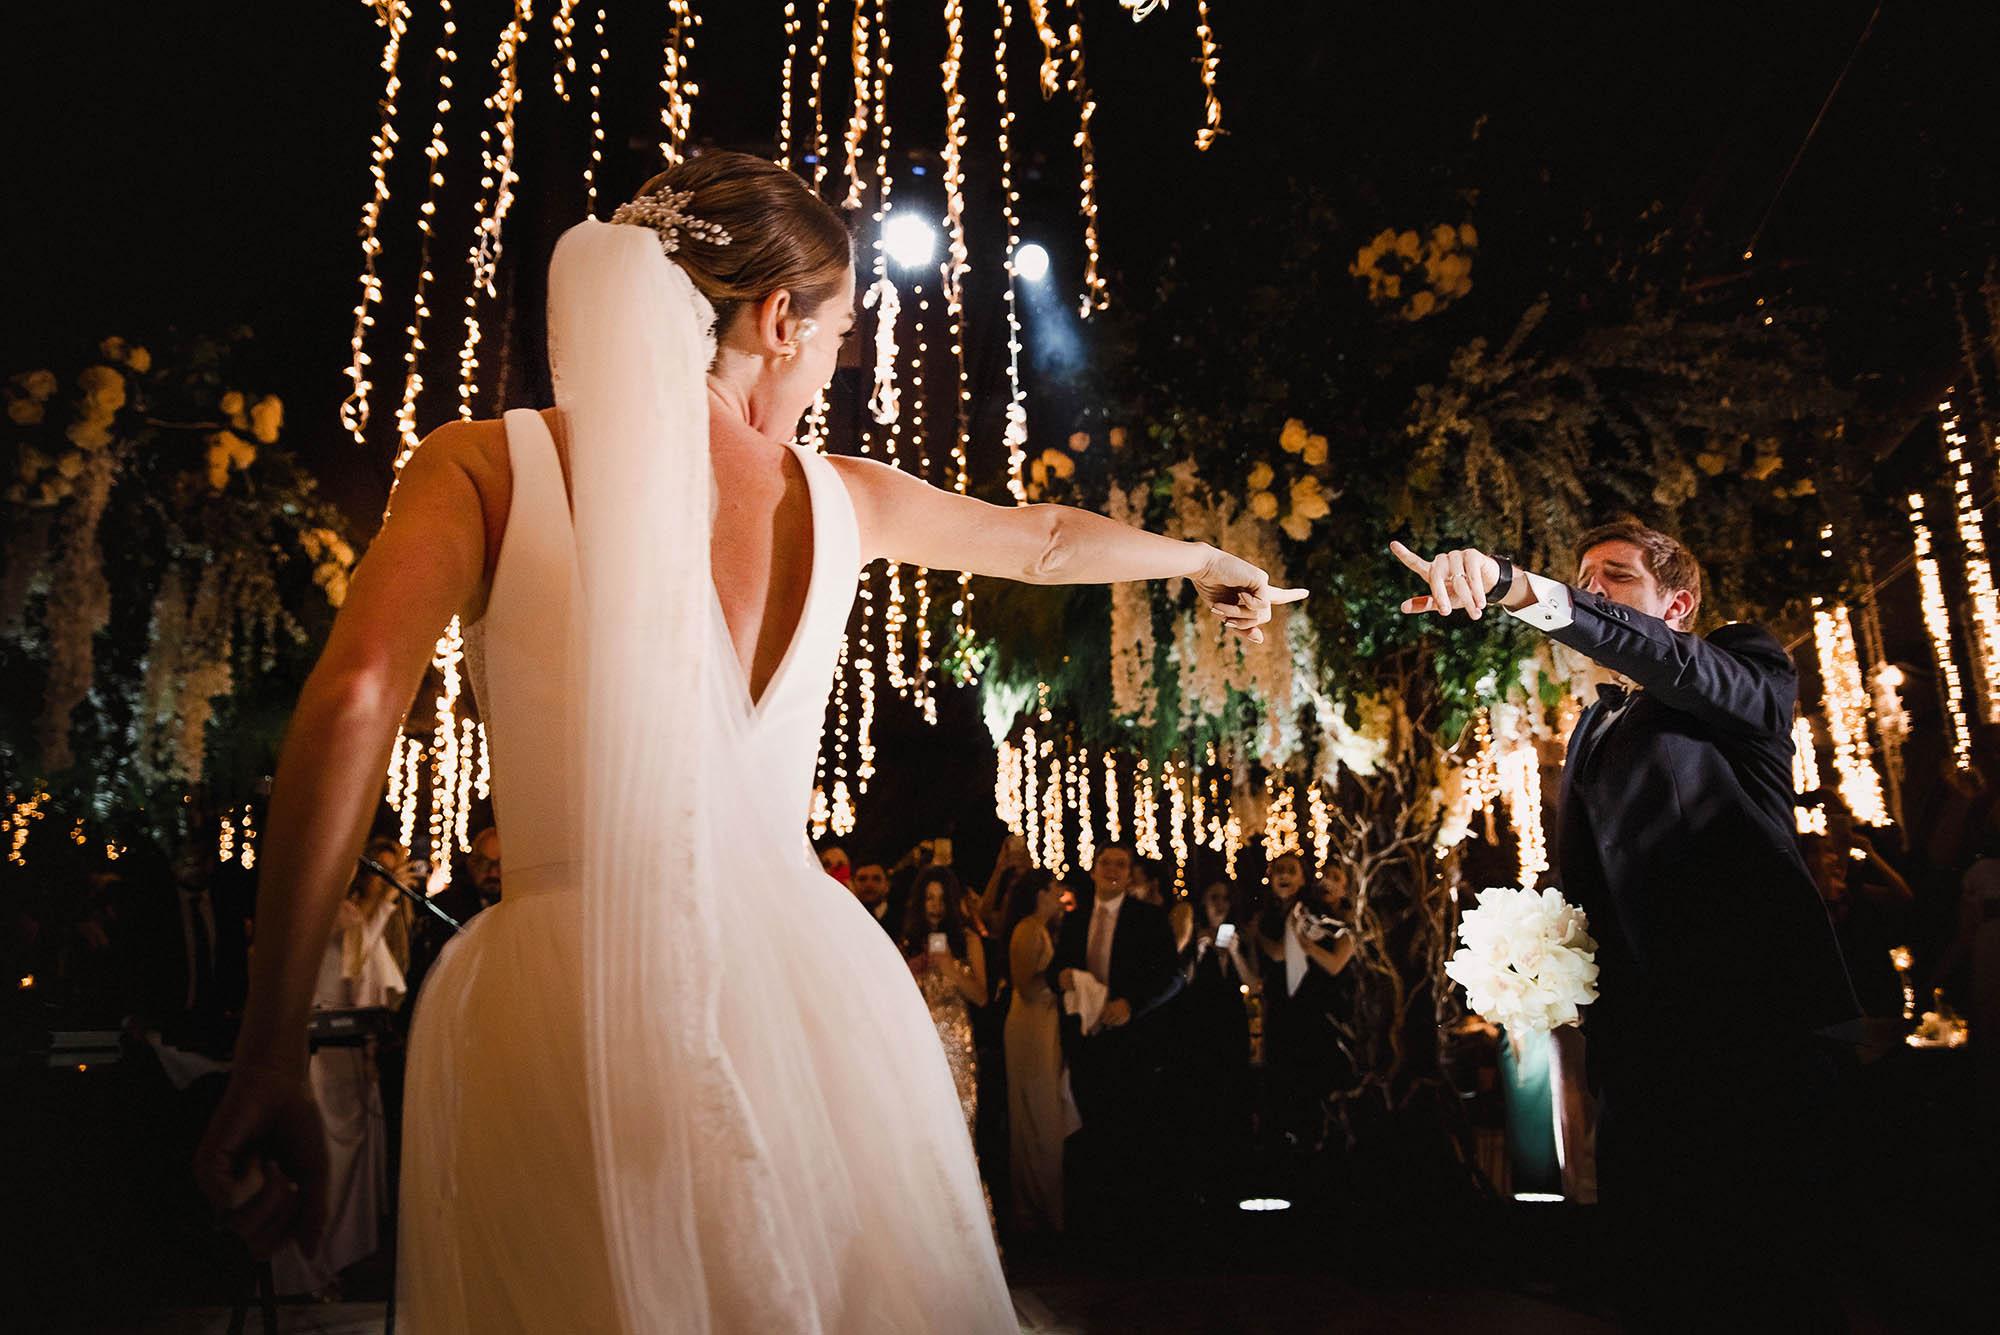 magali fotografo hacienda escoba guadalajara boda wedding 24.jpg